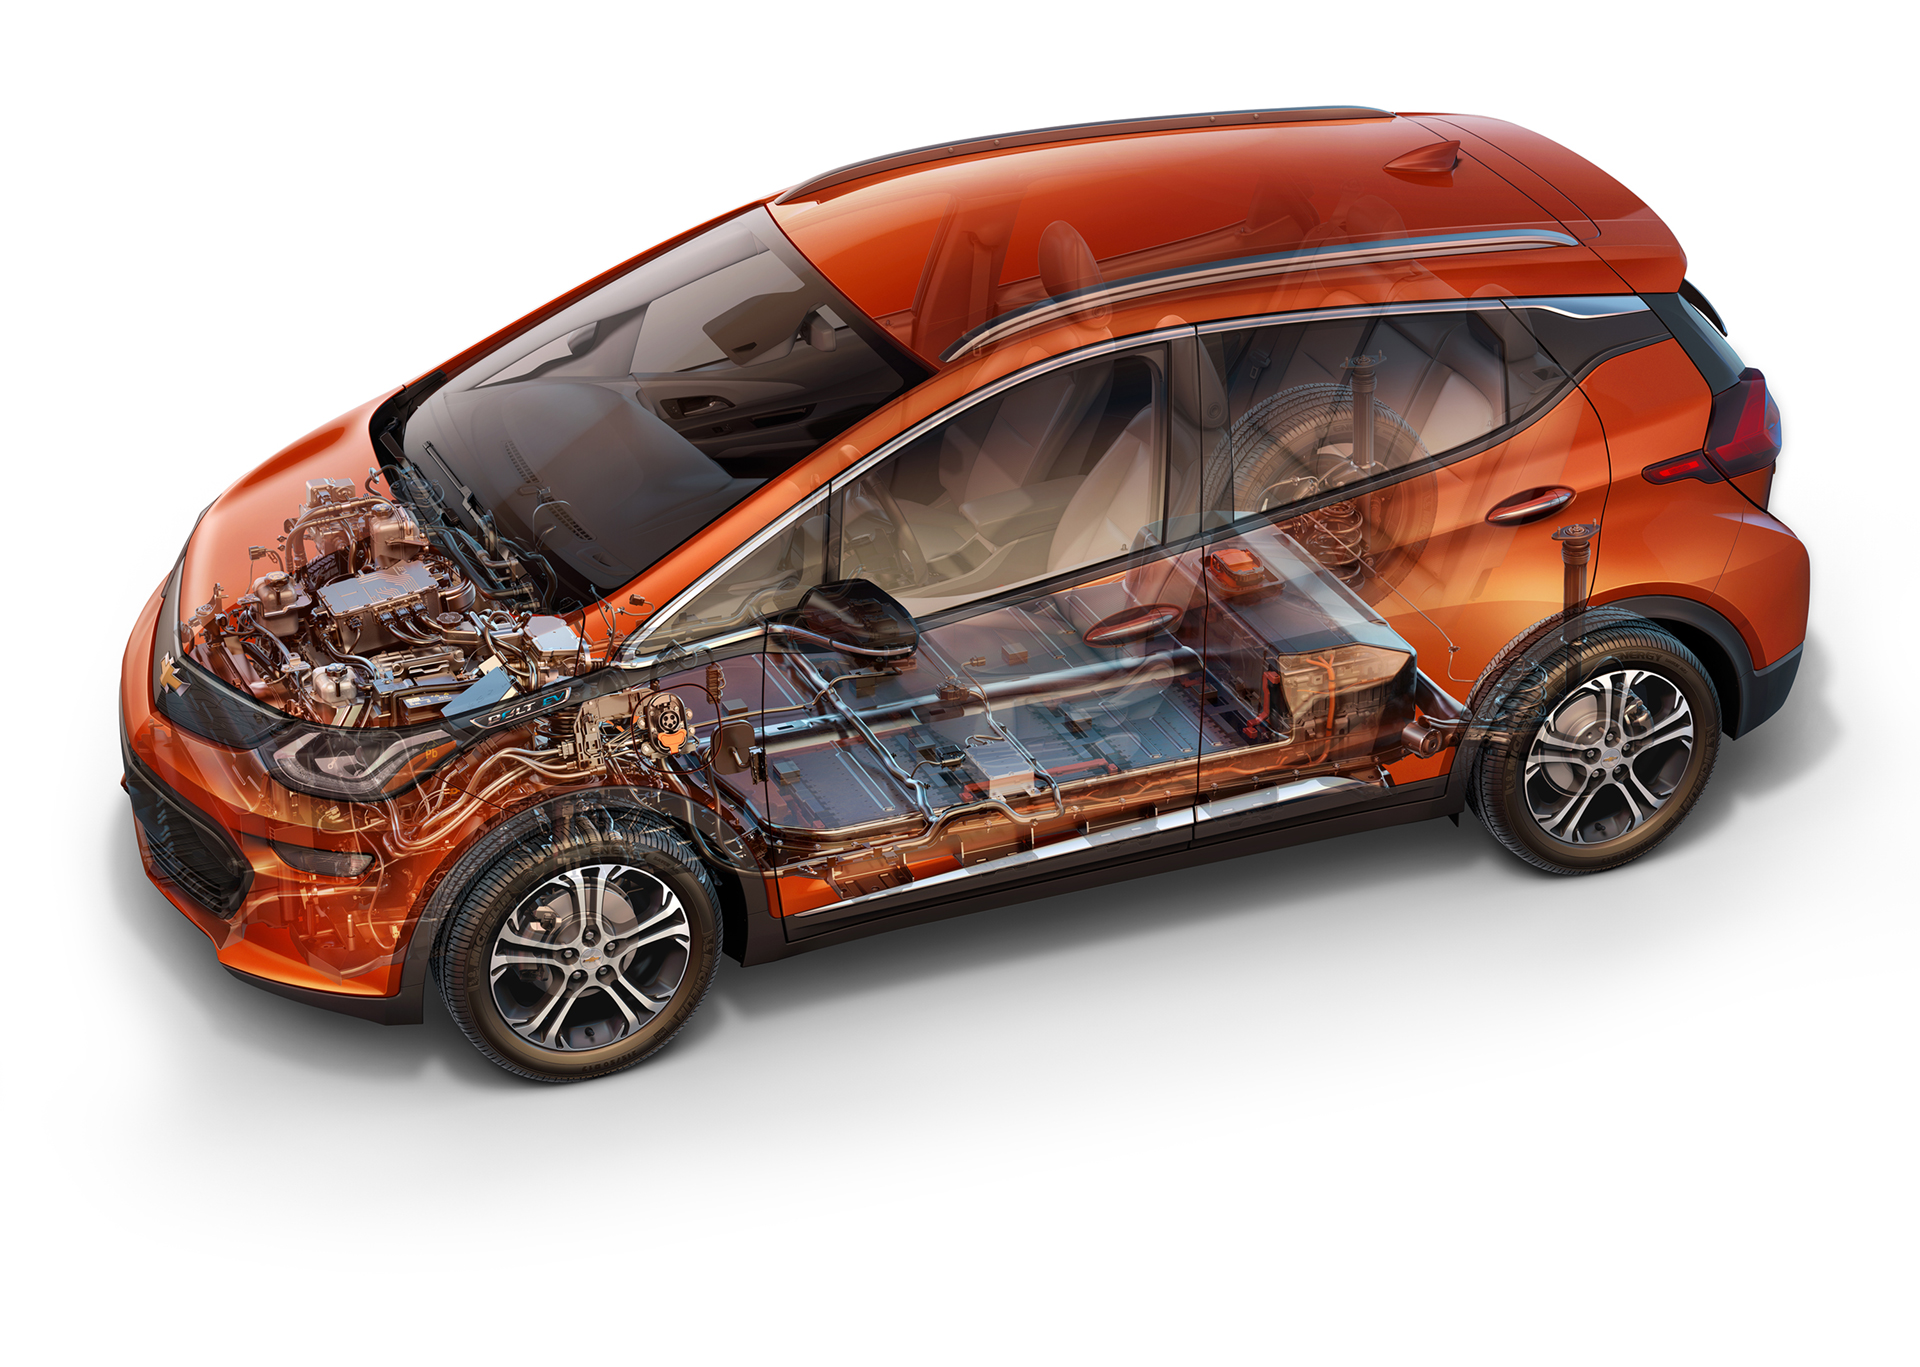 Chevrolet Bolt EV - 2016 - design mechanics - General Motors